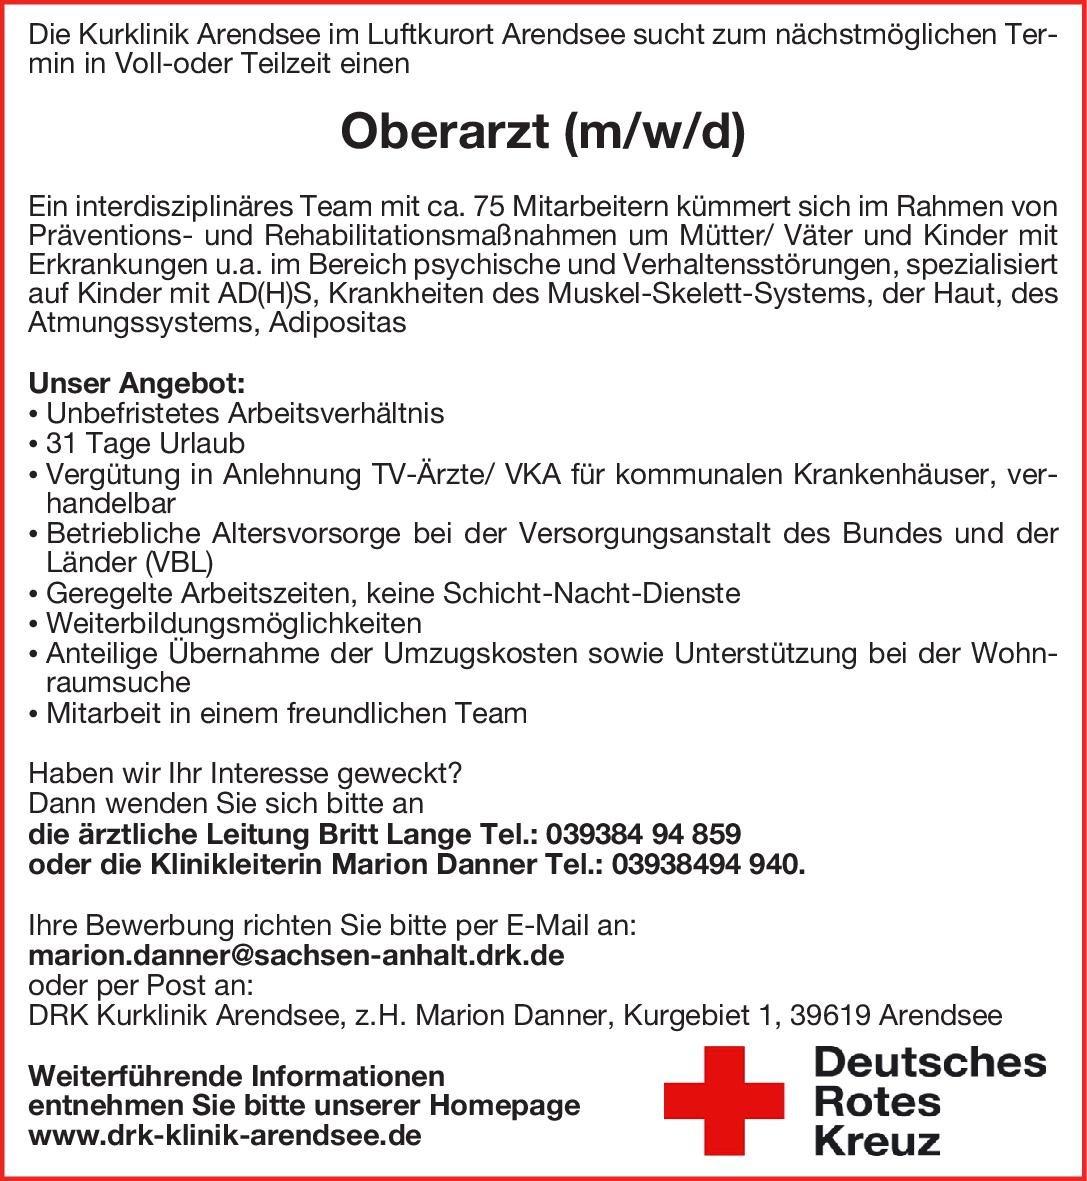 DRK Kurklinik Arendsee Oberarzt (m/w/d) Physikalische- und Rehabilitative Medizin Oberarzt